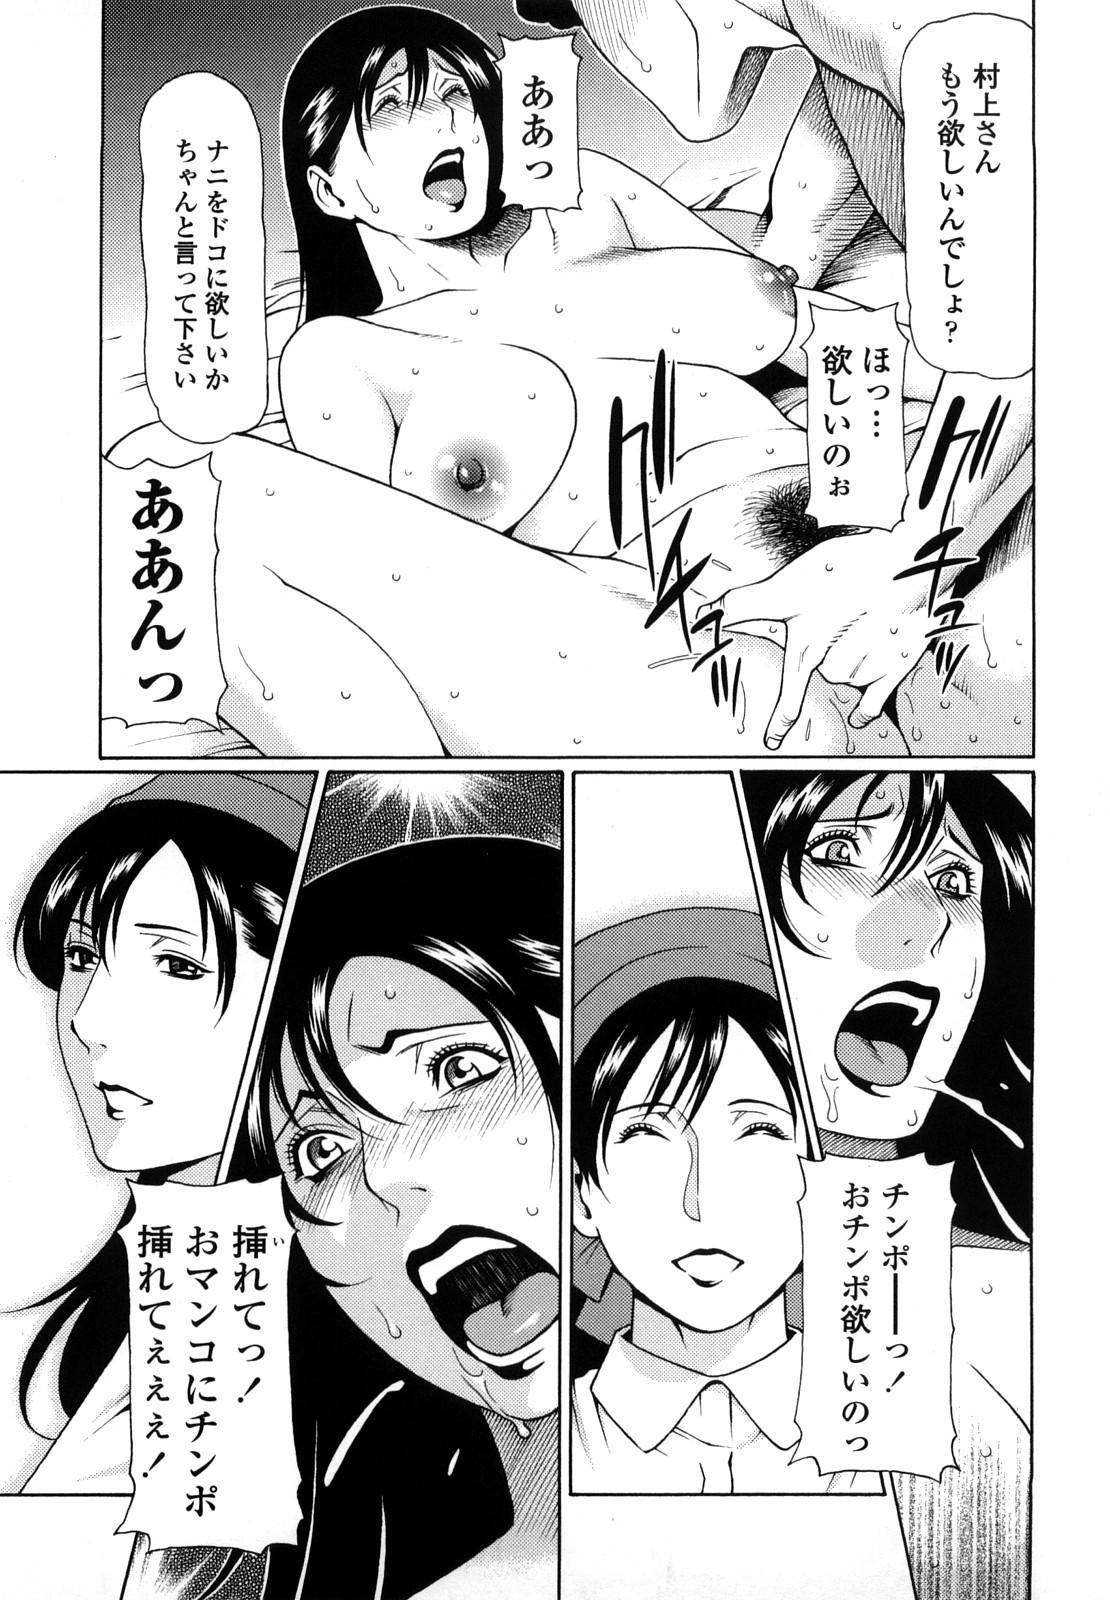 [Takasugi Kou] Kindan no Haha-Ana - Immorality Love-Hole [Decensored] 148